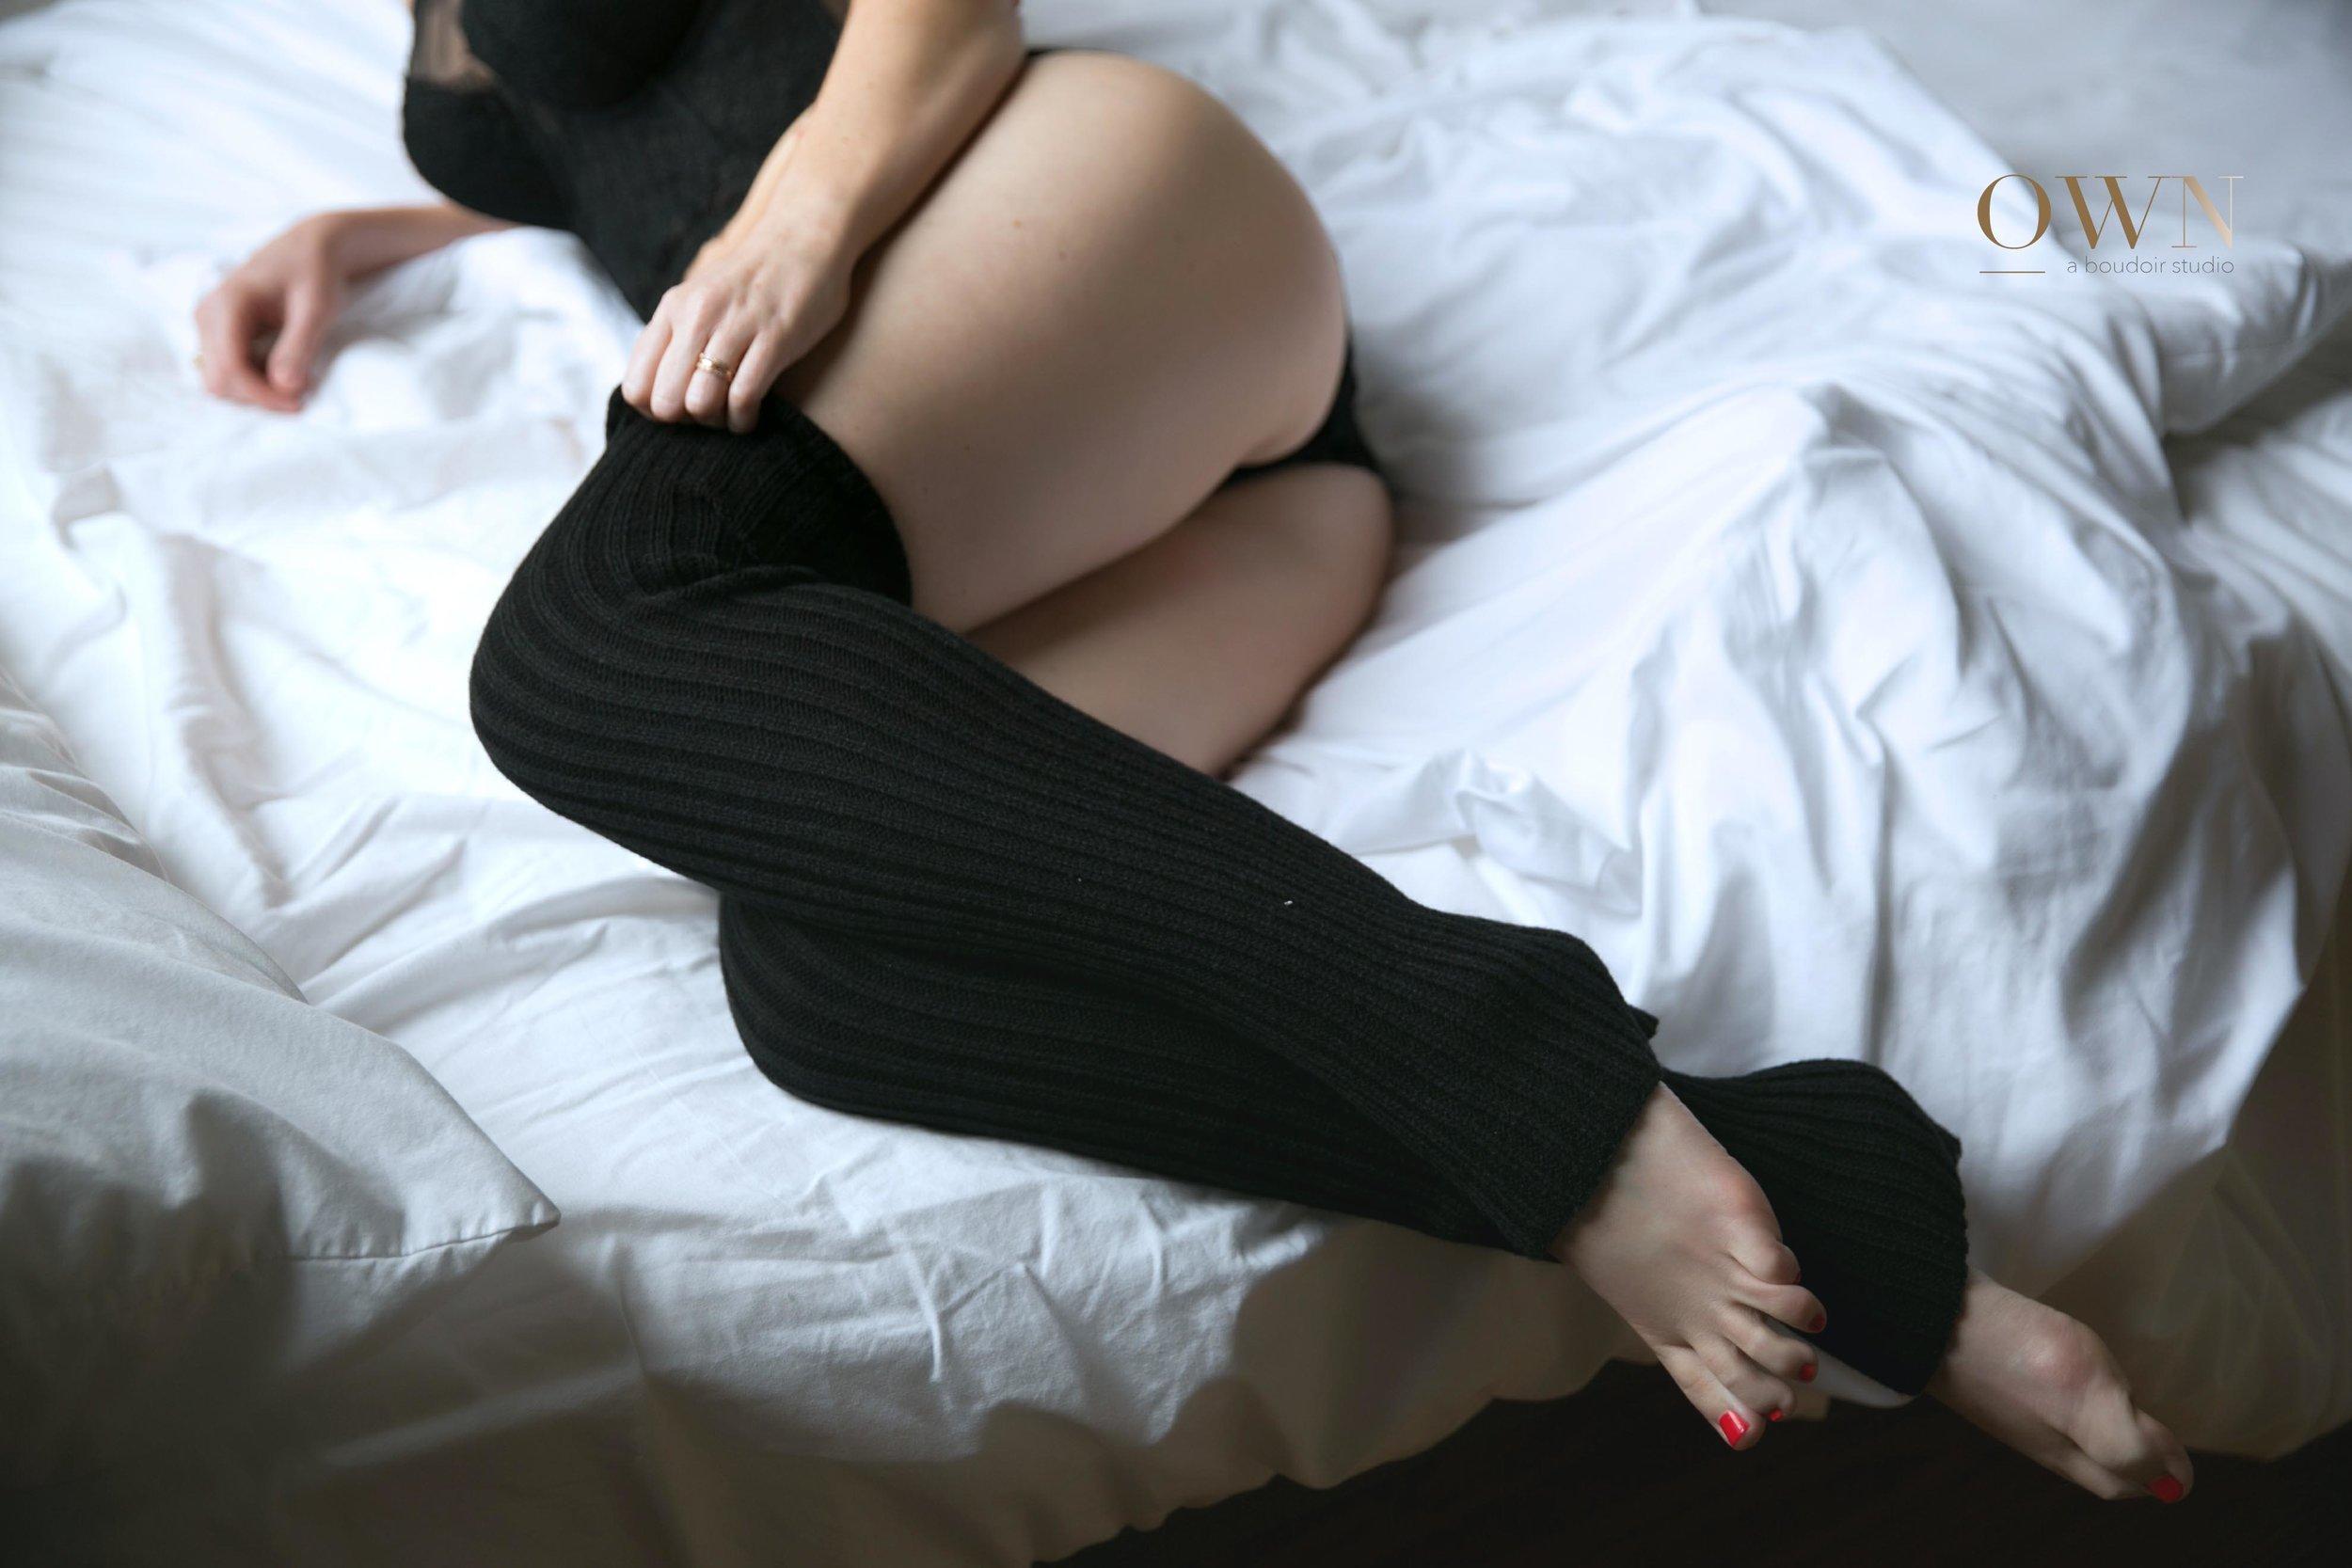 lingerie photography, boudoir atlanta, atlanta boudoir photographer, own boudoir, leg warmer boudoir, boudoir pose ideas, boudoir ideas, best boudoir photographer.jpg